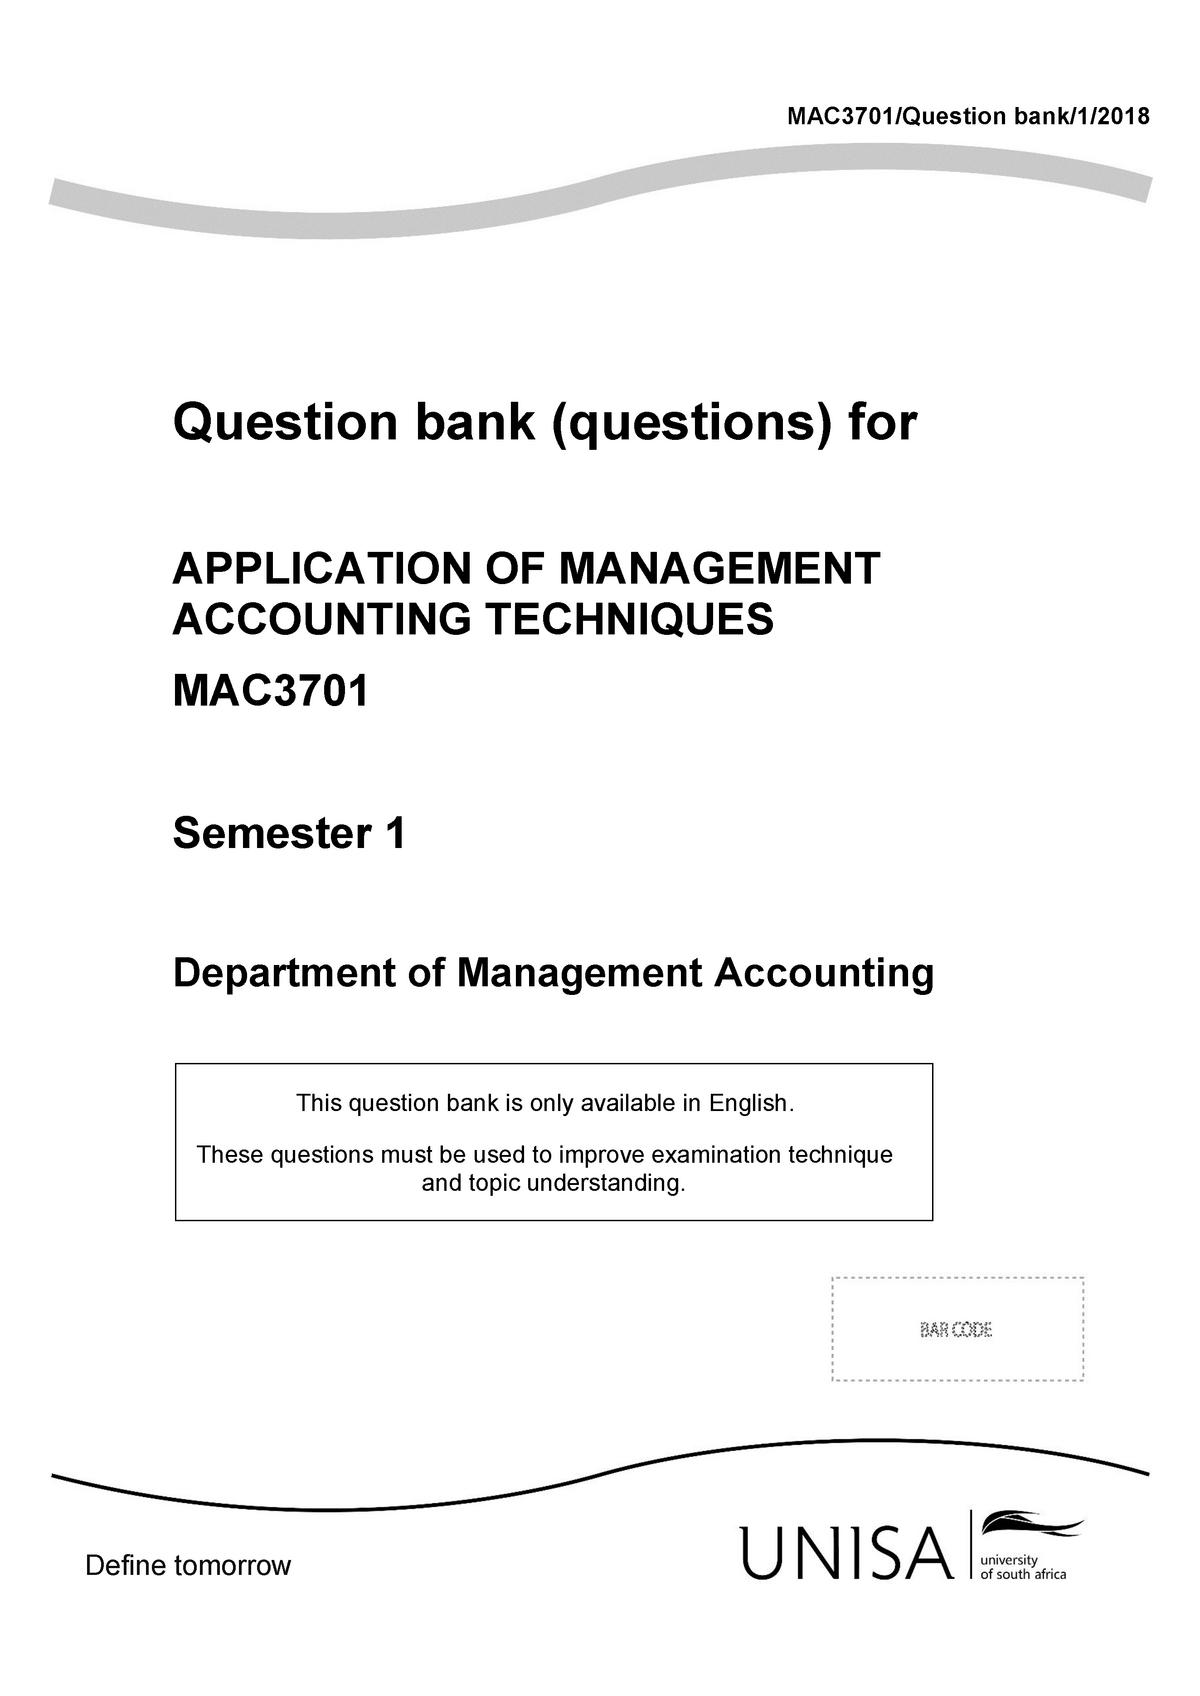 Exam 2018, questions and answers - Mac3701 - UNISA - StuDocu